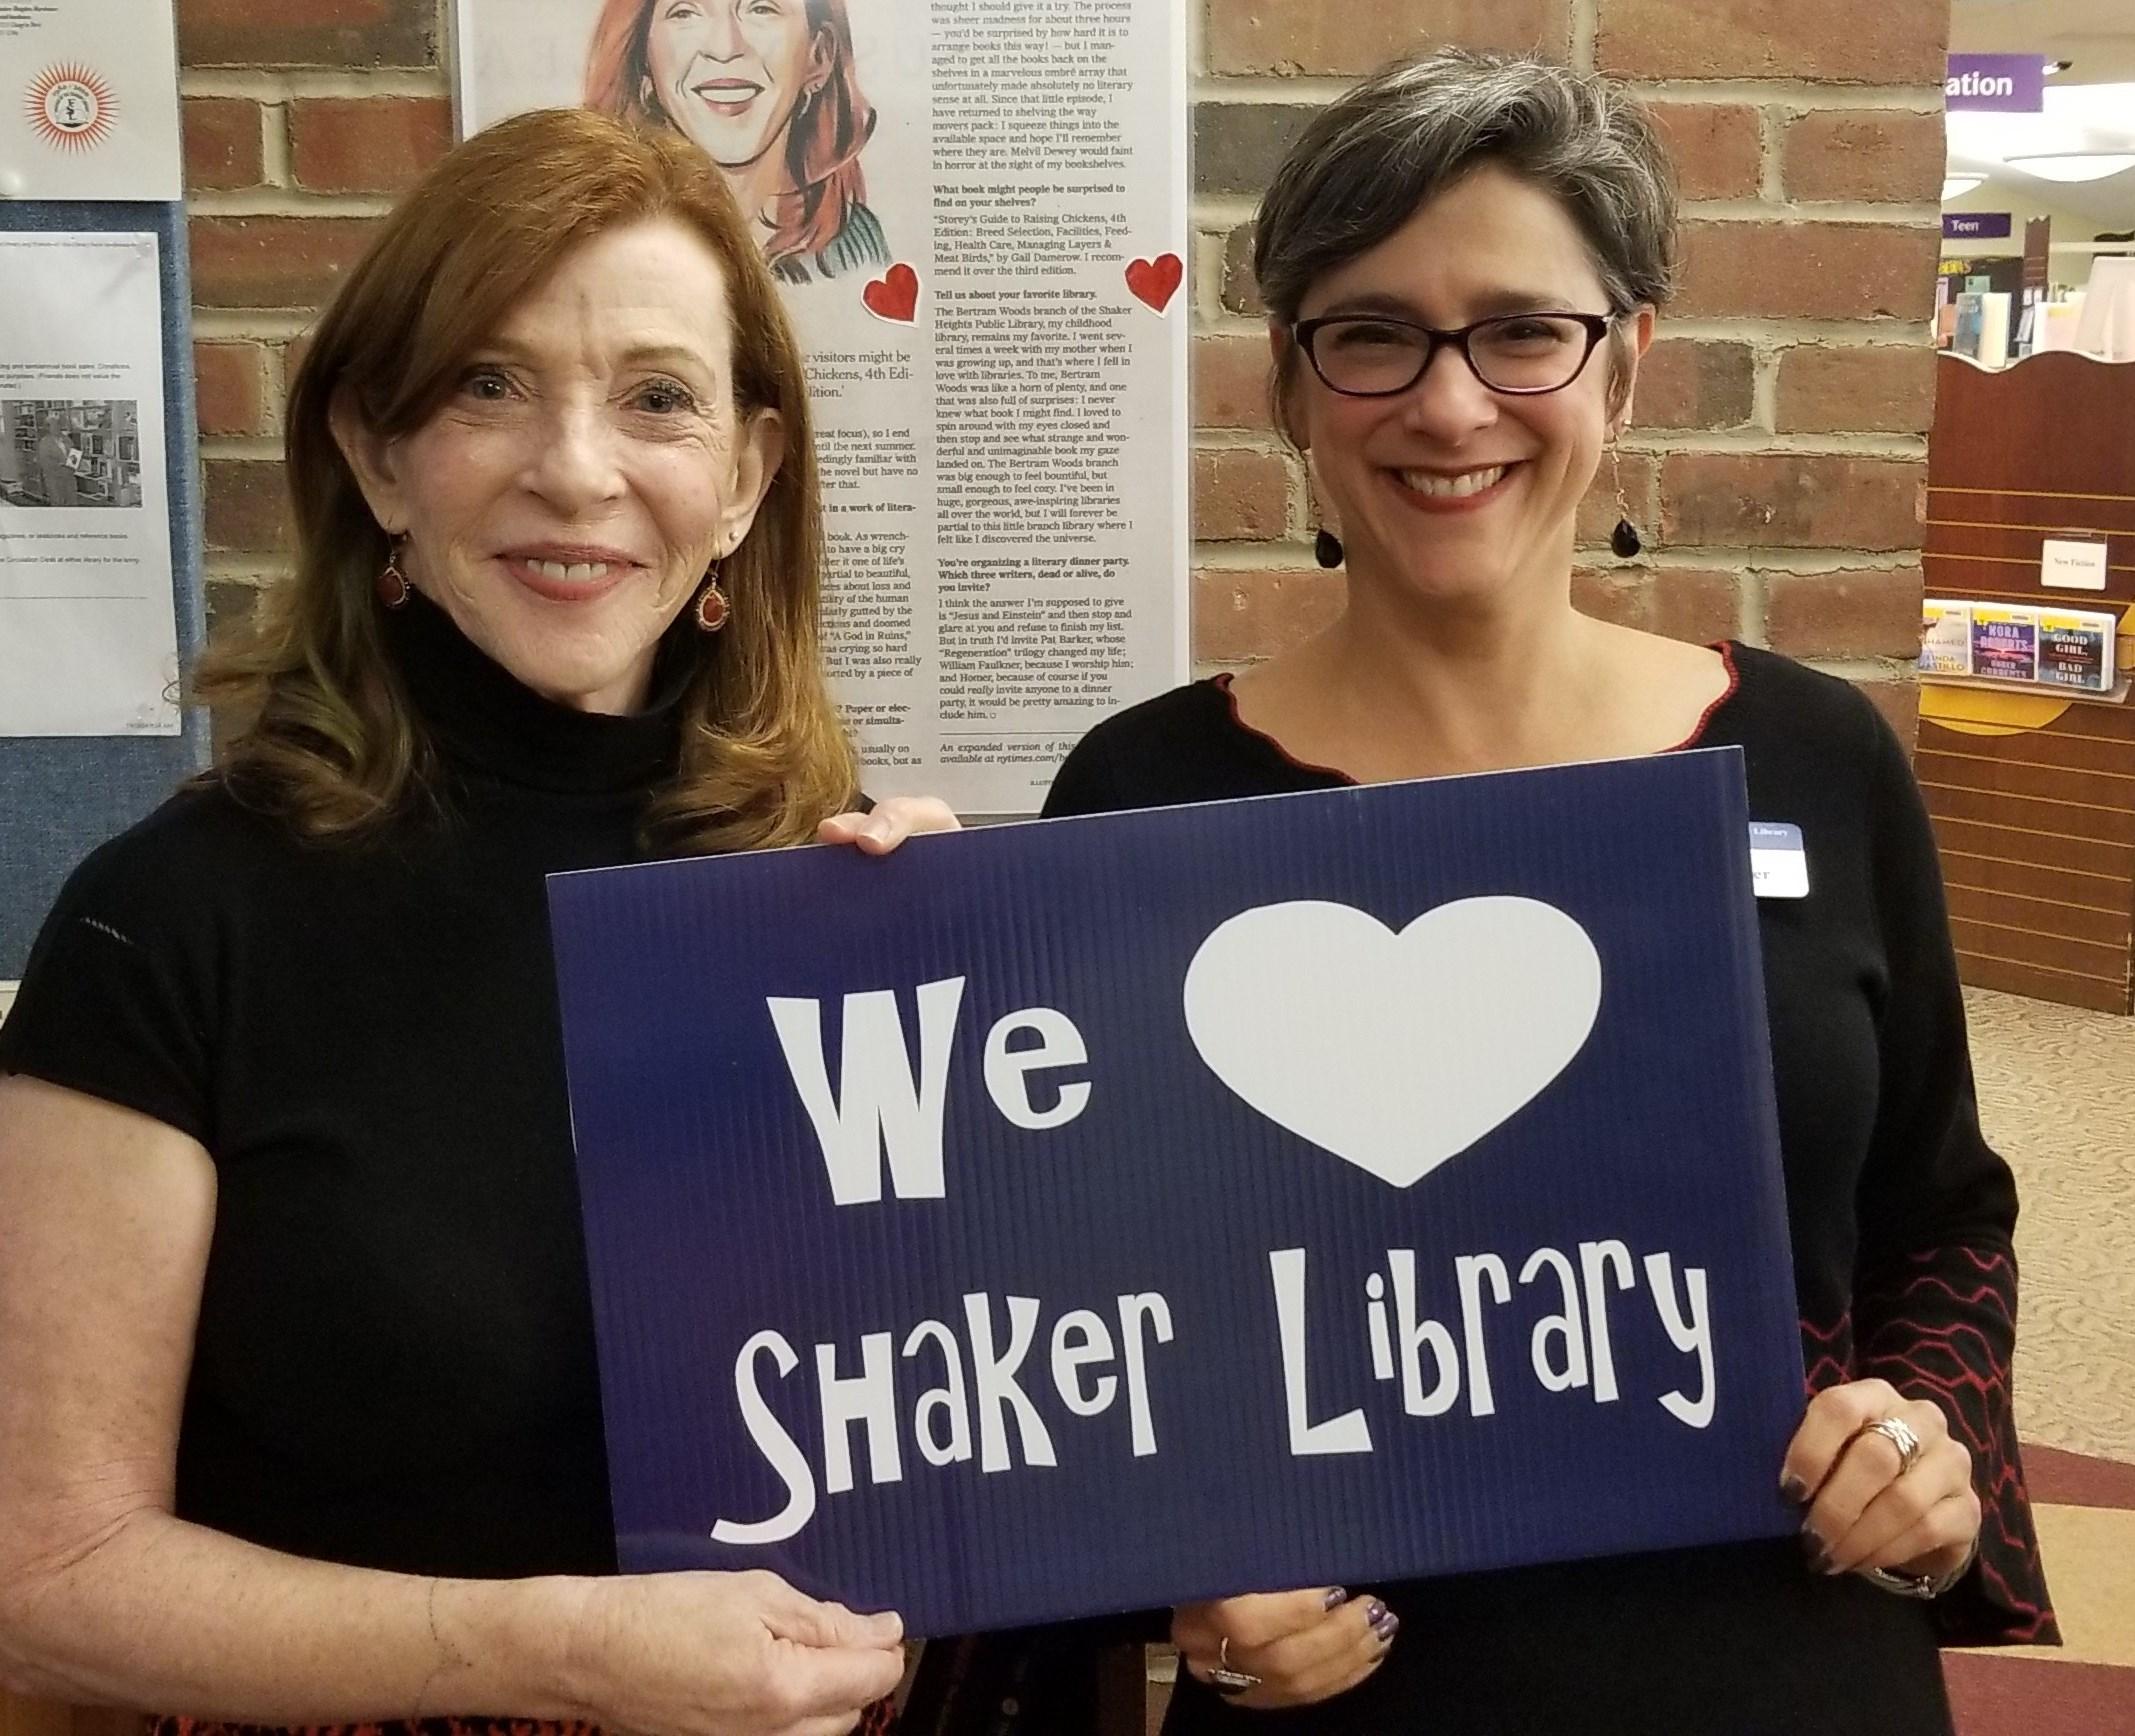 Shaker Hts library photo